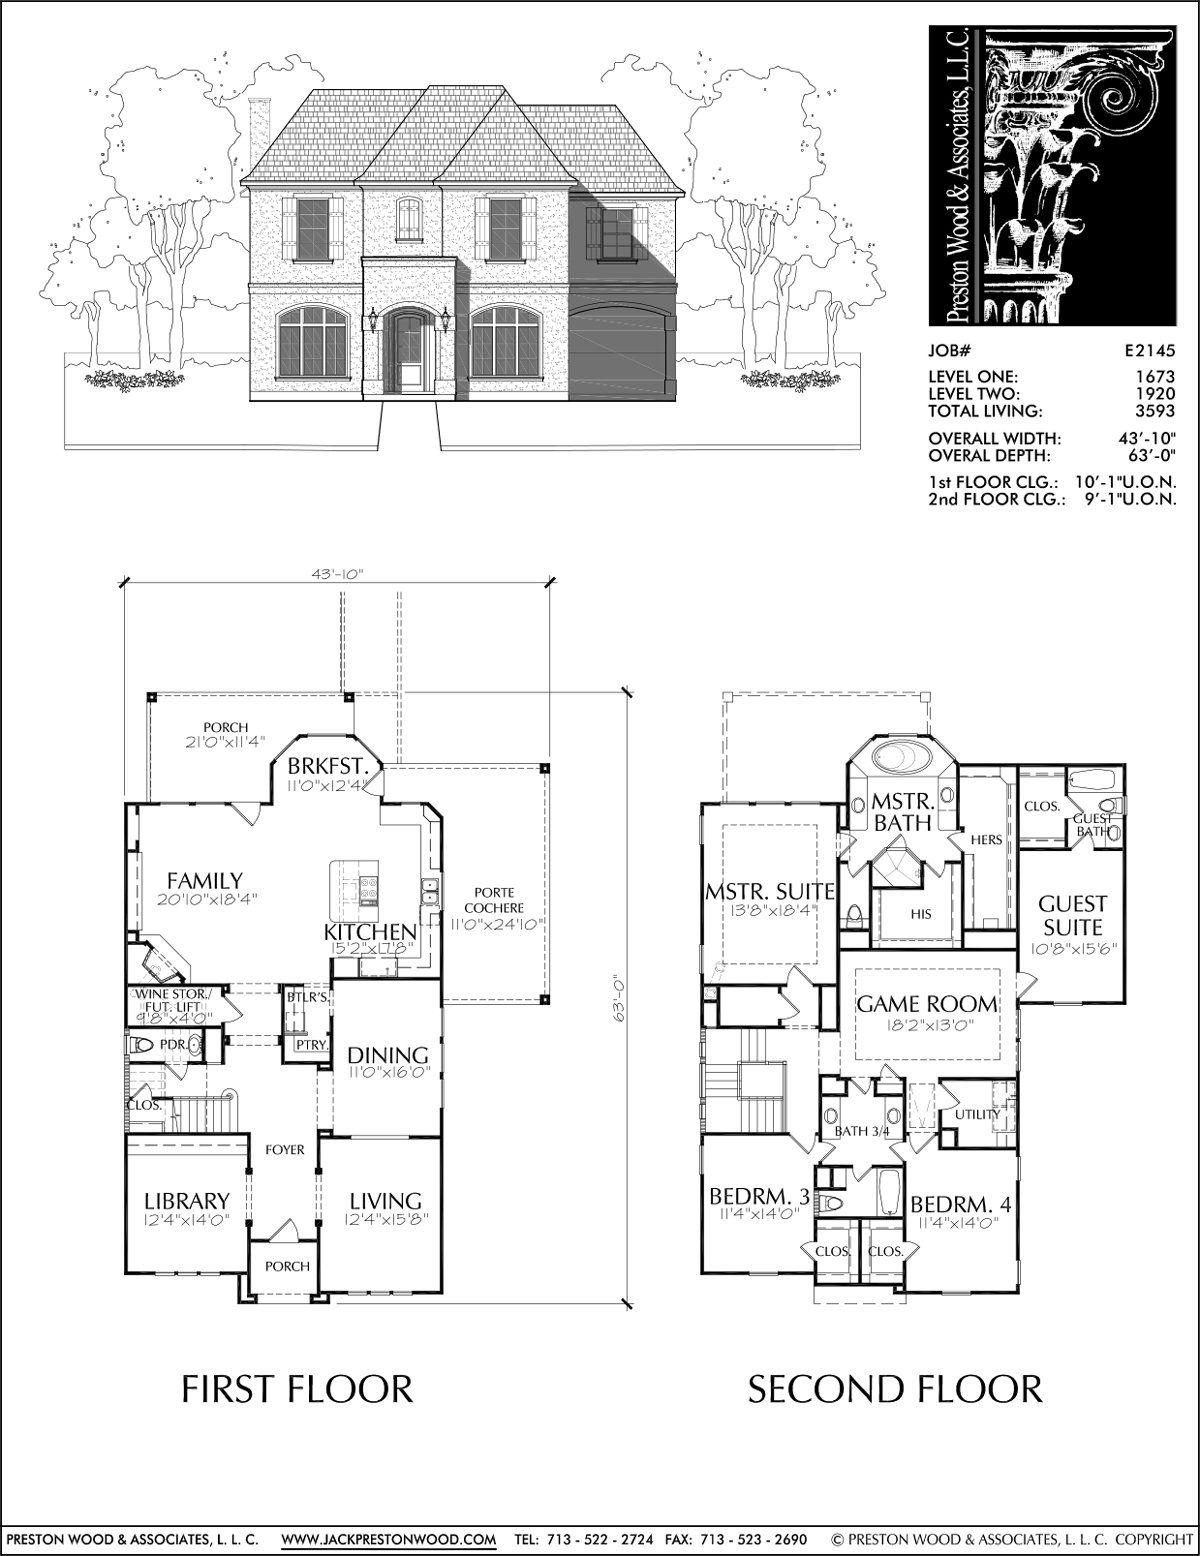 2 Story House Plan Residential Floor Plans Family Home Blueprints D Preston Wood Associates House Plans House Blueprints